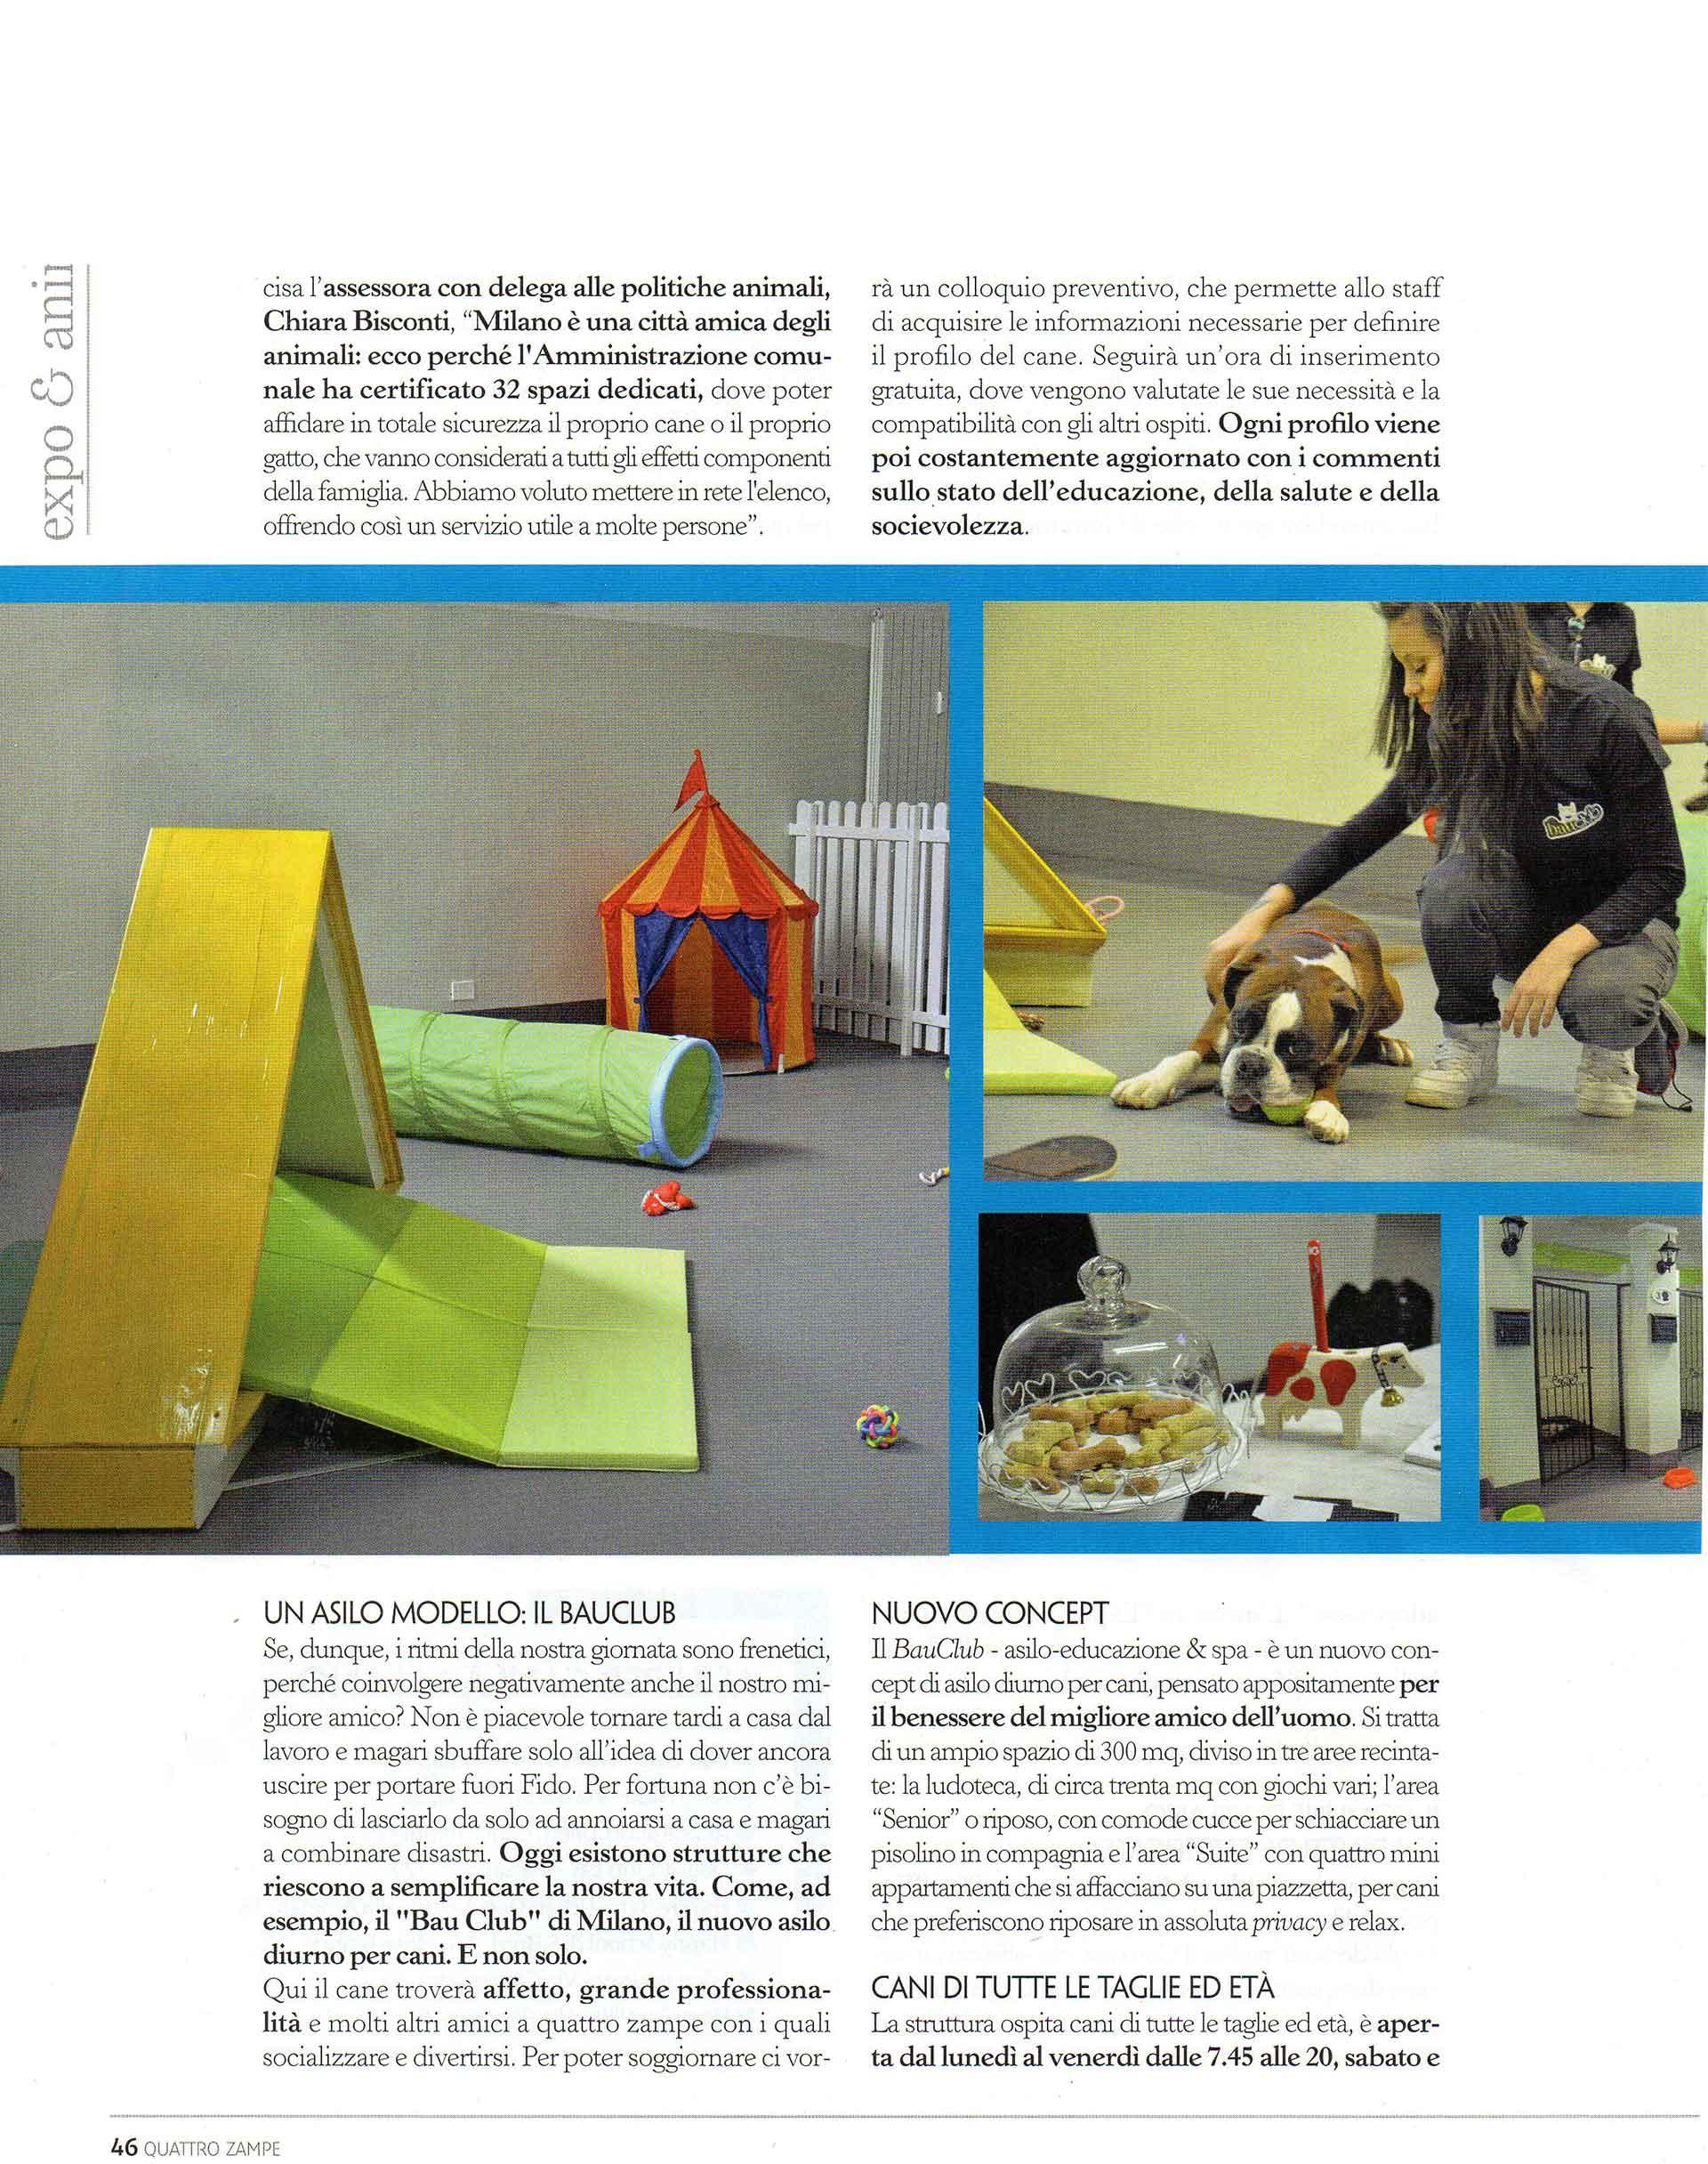 quattro-zampe-bauclub-asilo-educazione-cani-milano-04